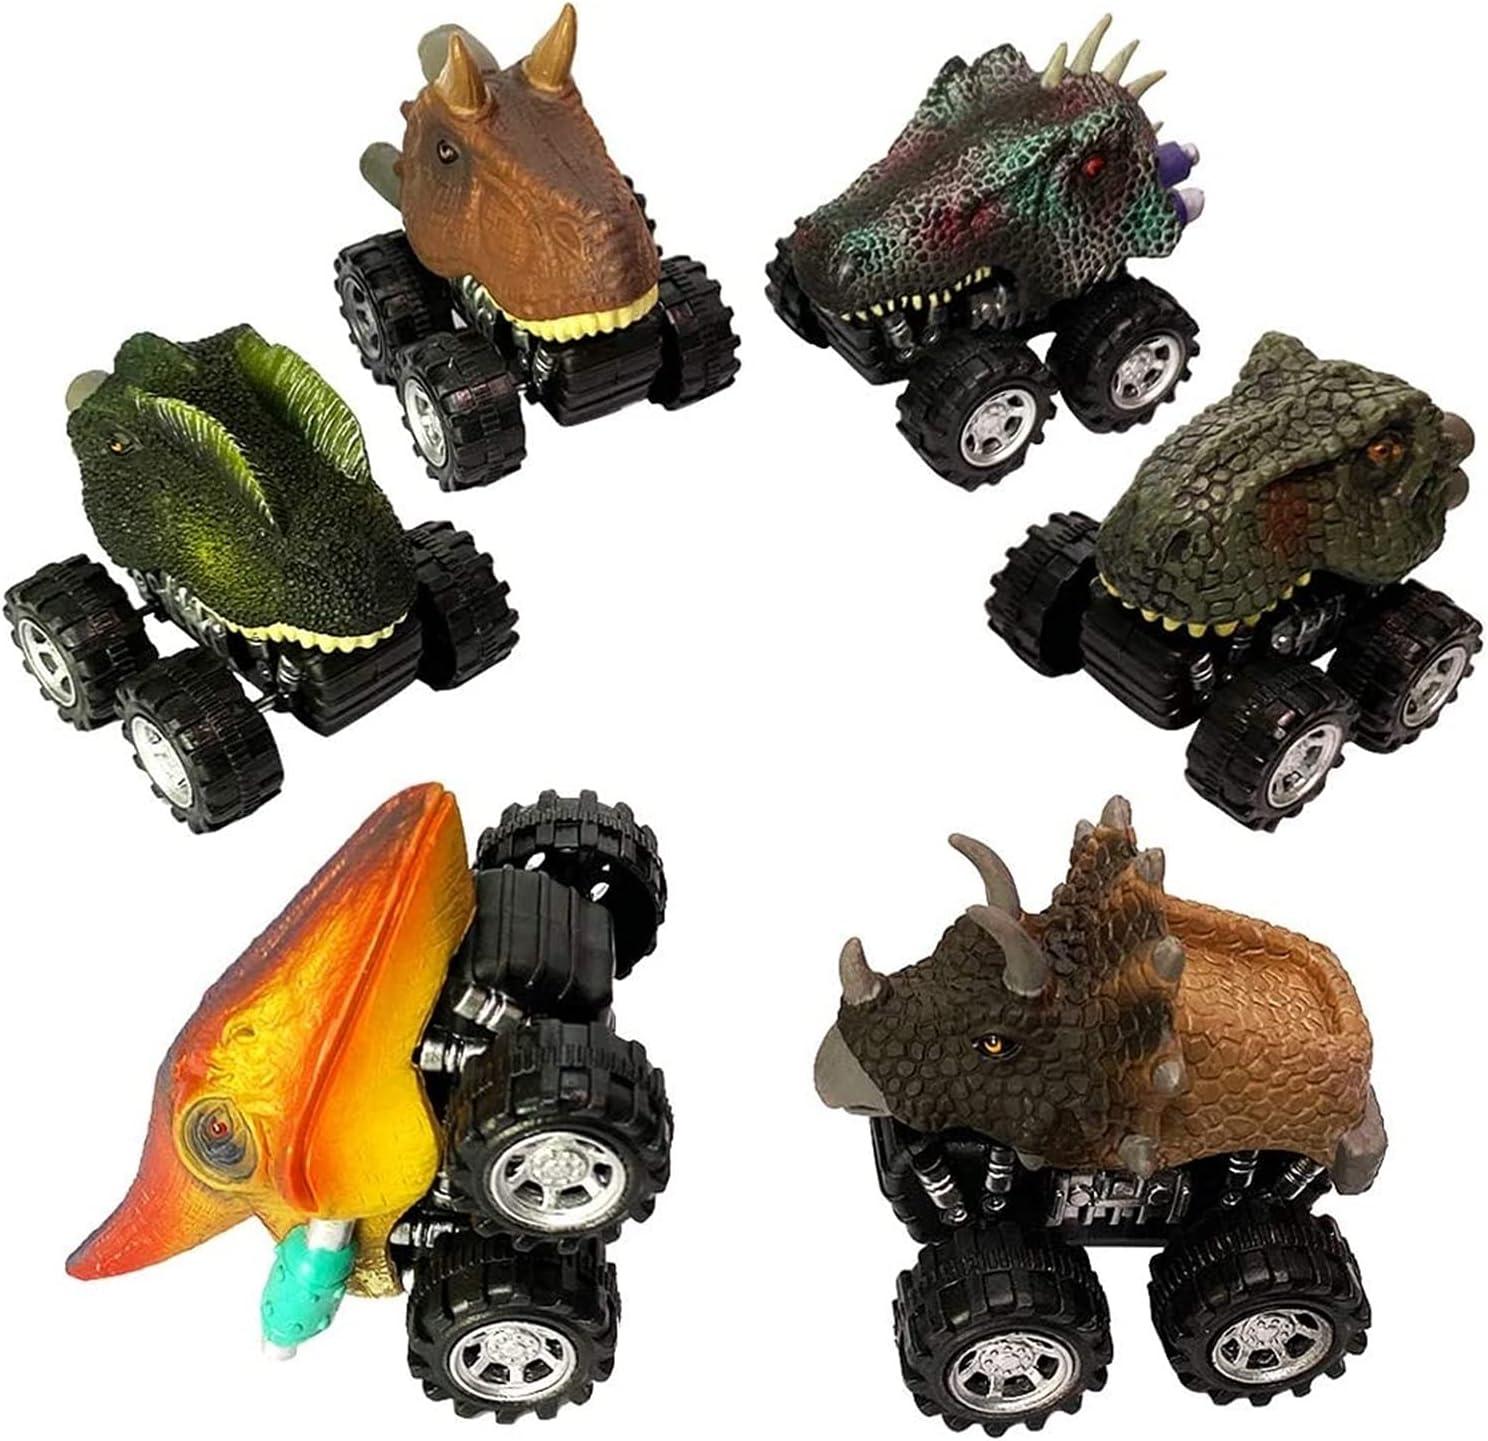 TXXM Educational Toy Super-cheap excellence Car Simulation Pull Back Dinosaur Chari